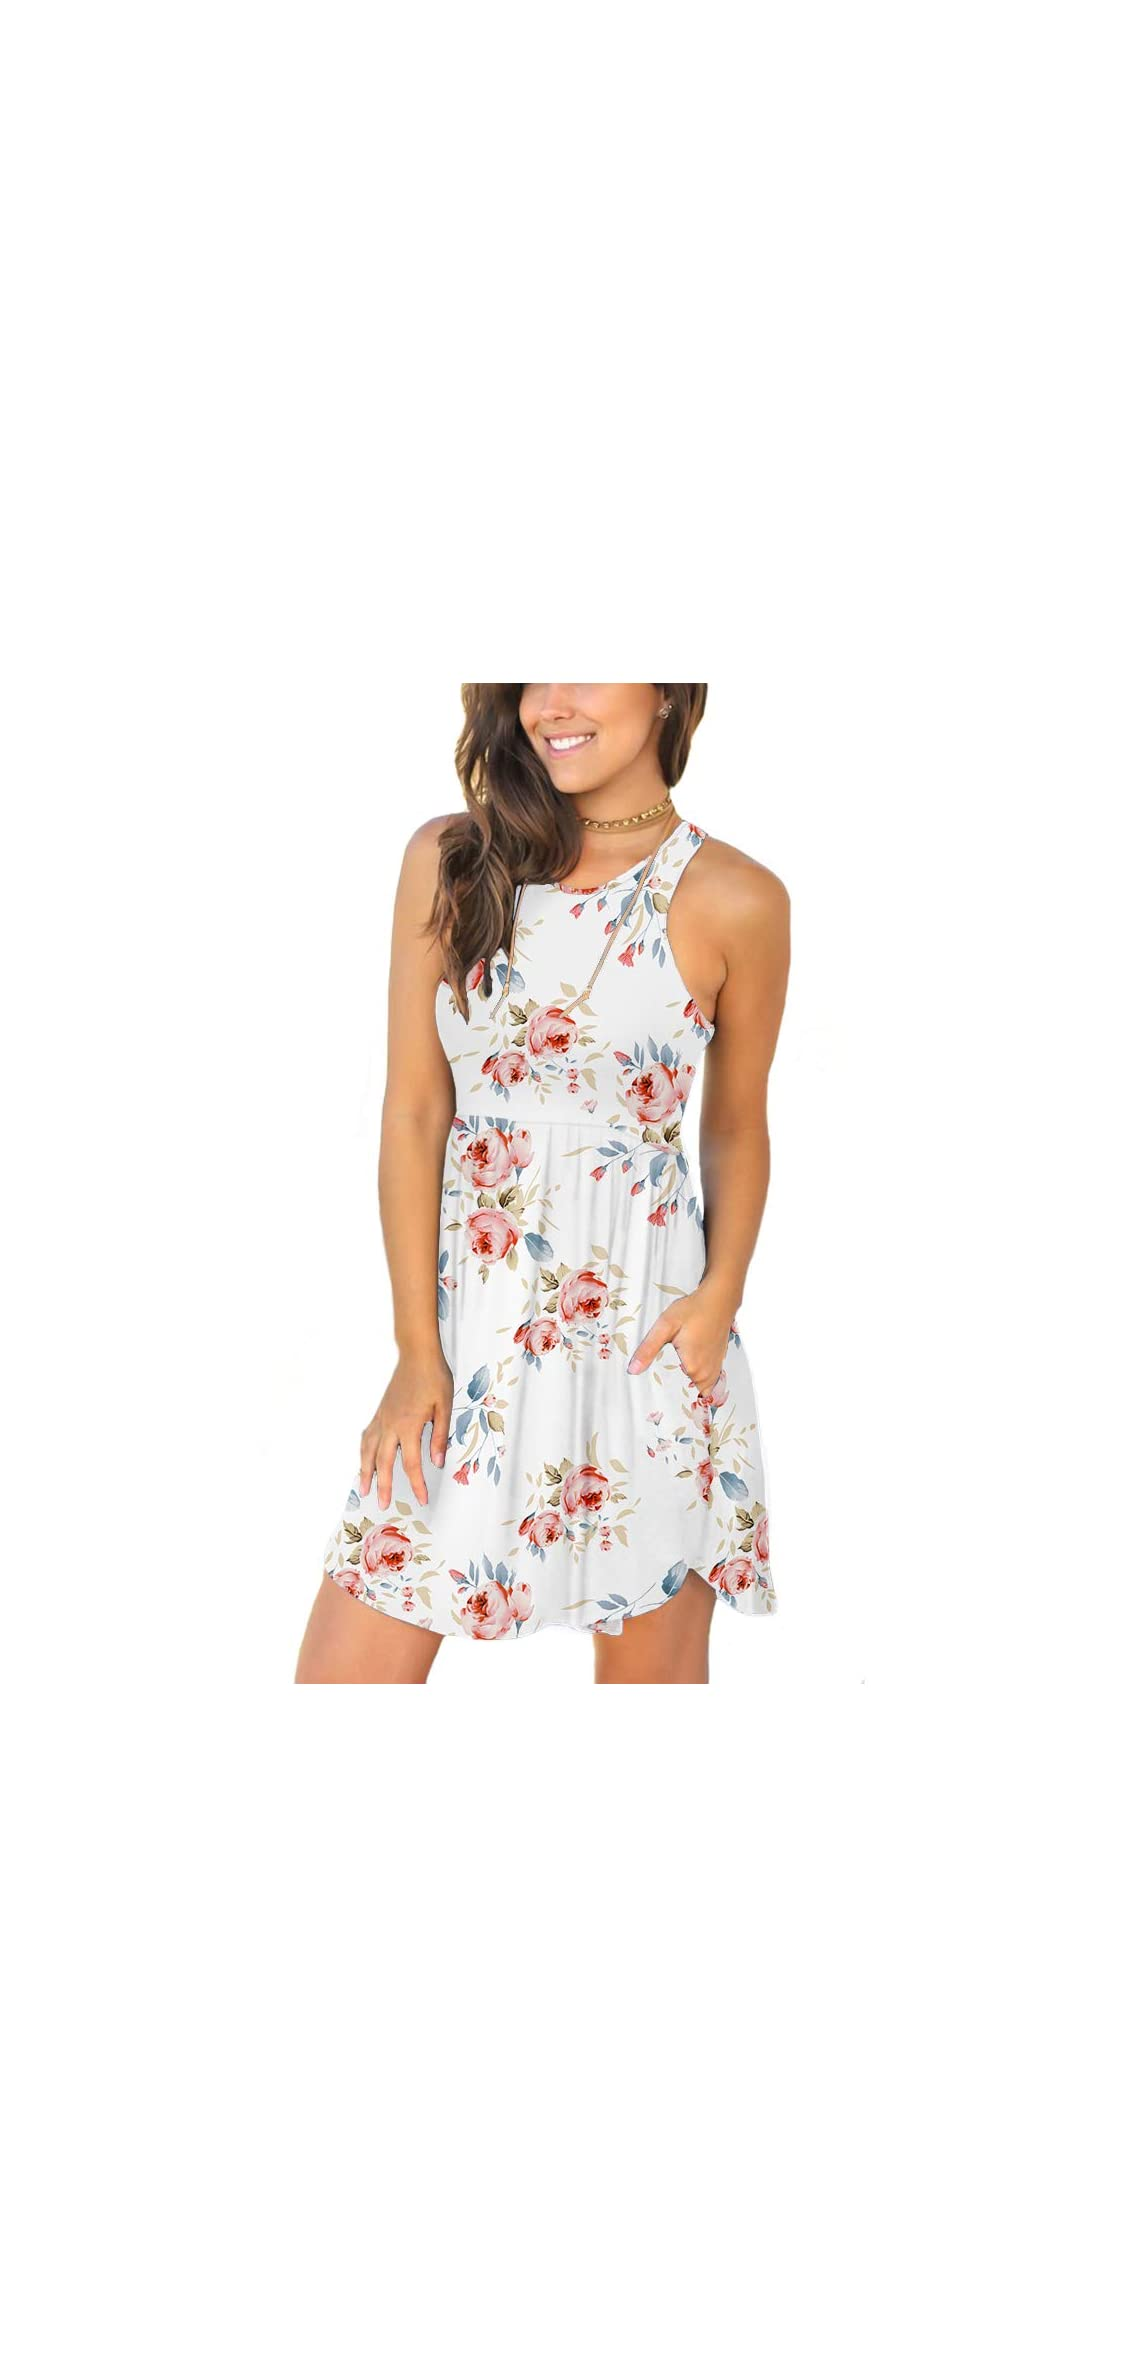 Women's Summer Casual T Shirt Dresses Swimsuit Cover